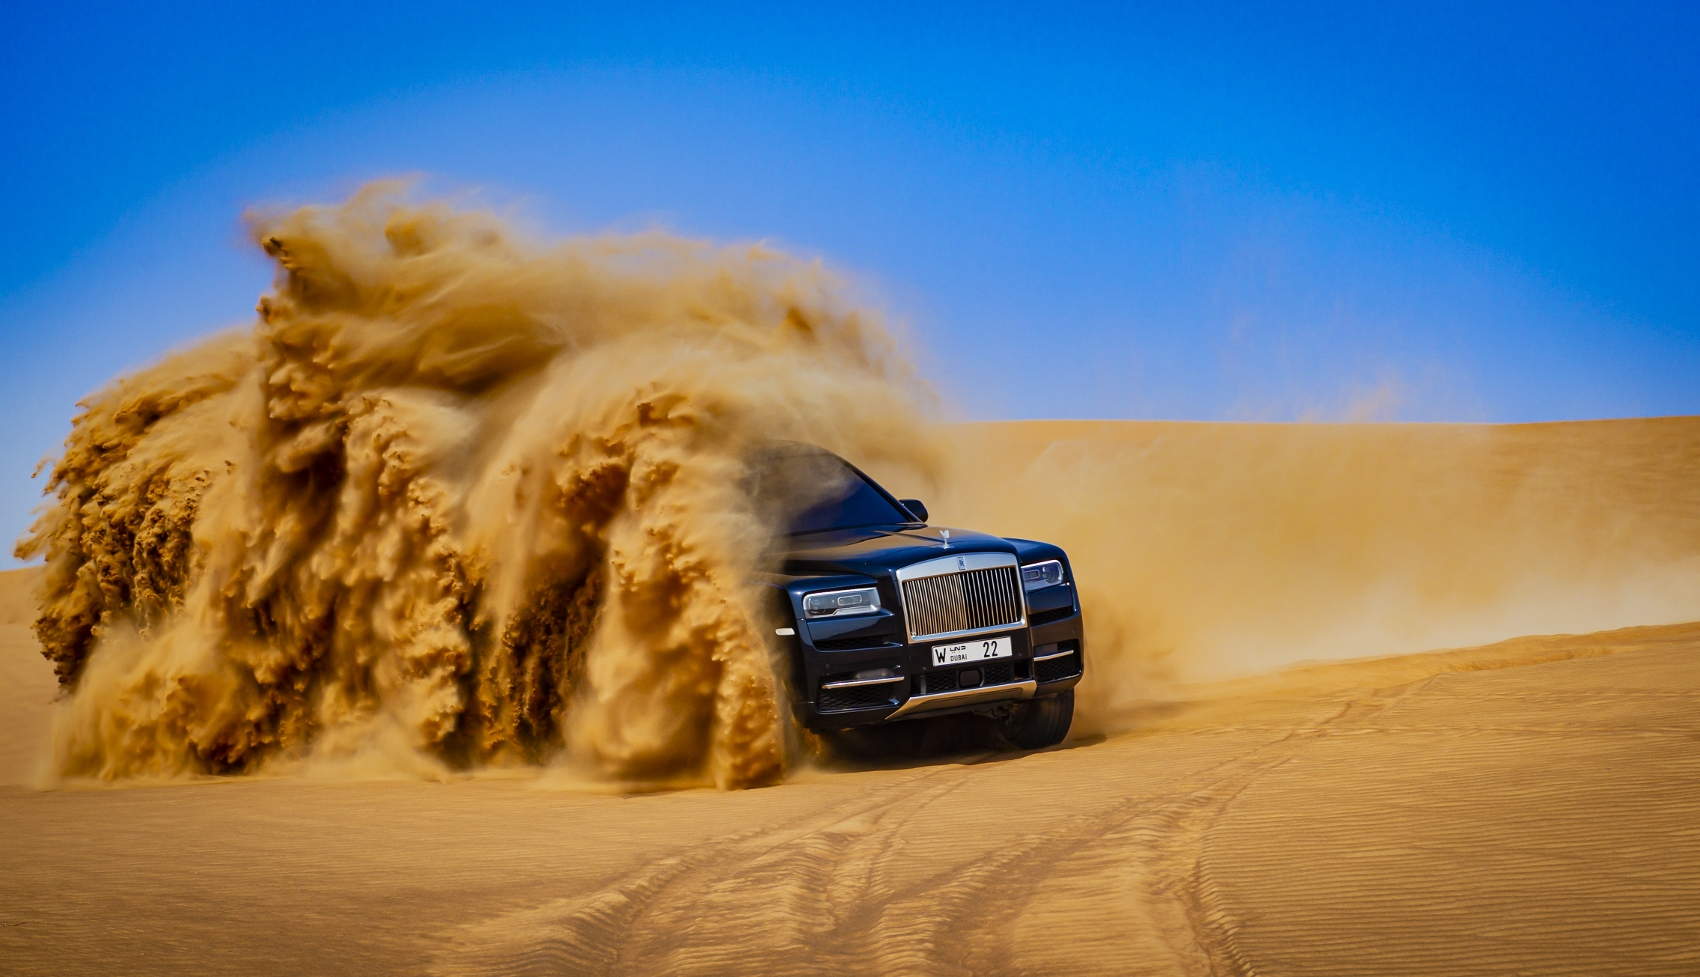 Rolls Royce Cullinan sa predviedol na púšti. Pozrite si foto aj video KflFGyUIY7 rolls-royce-cullina